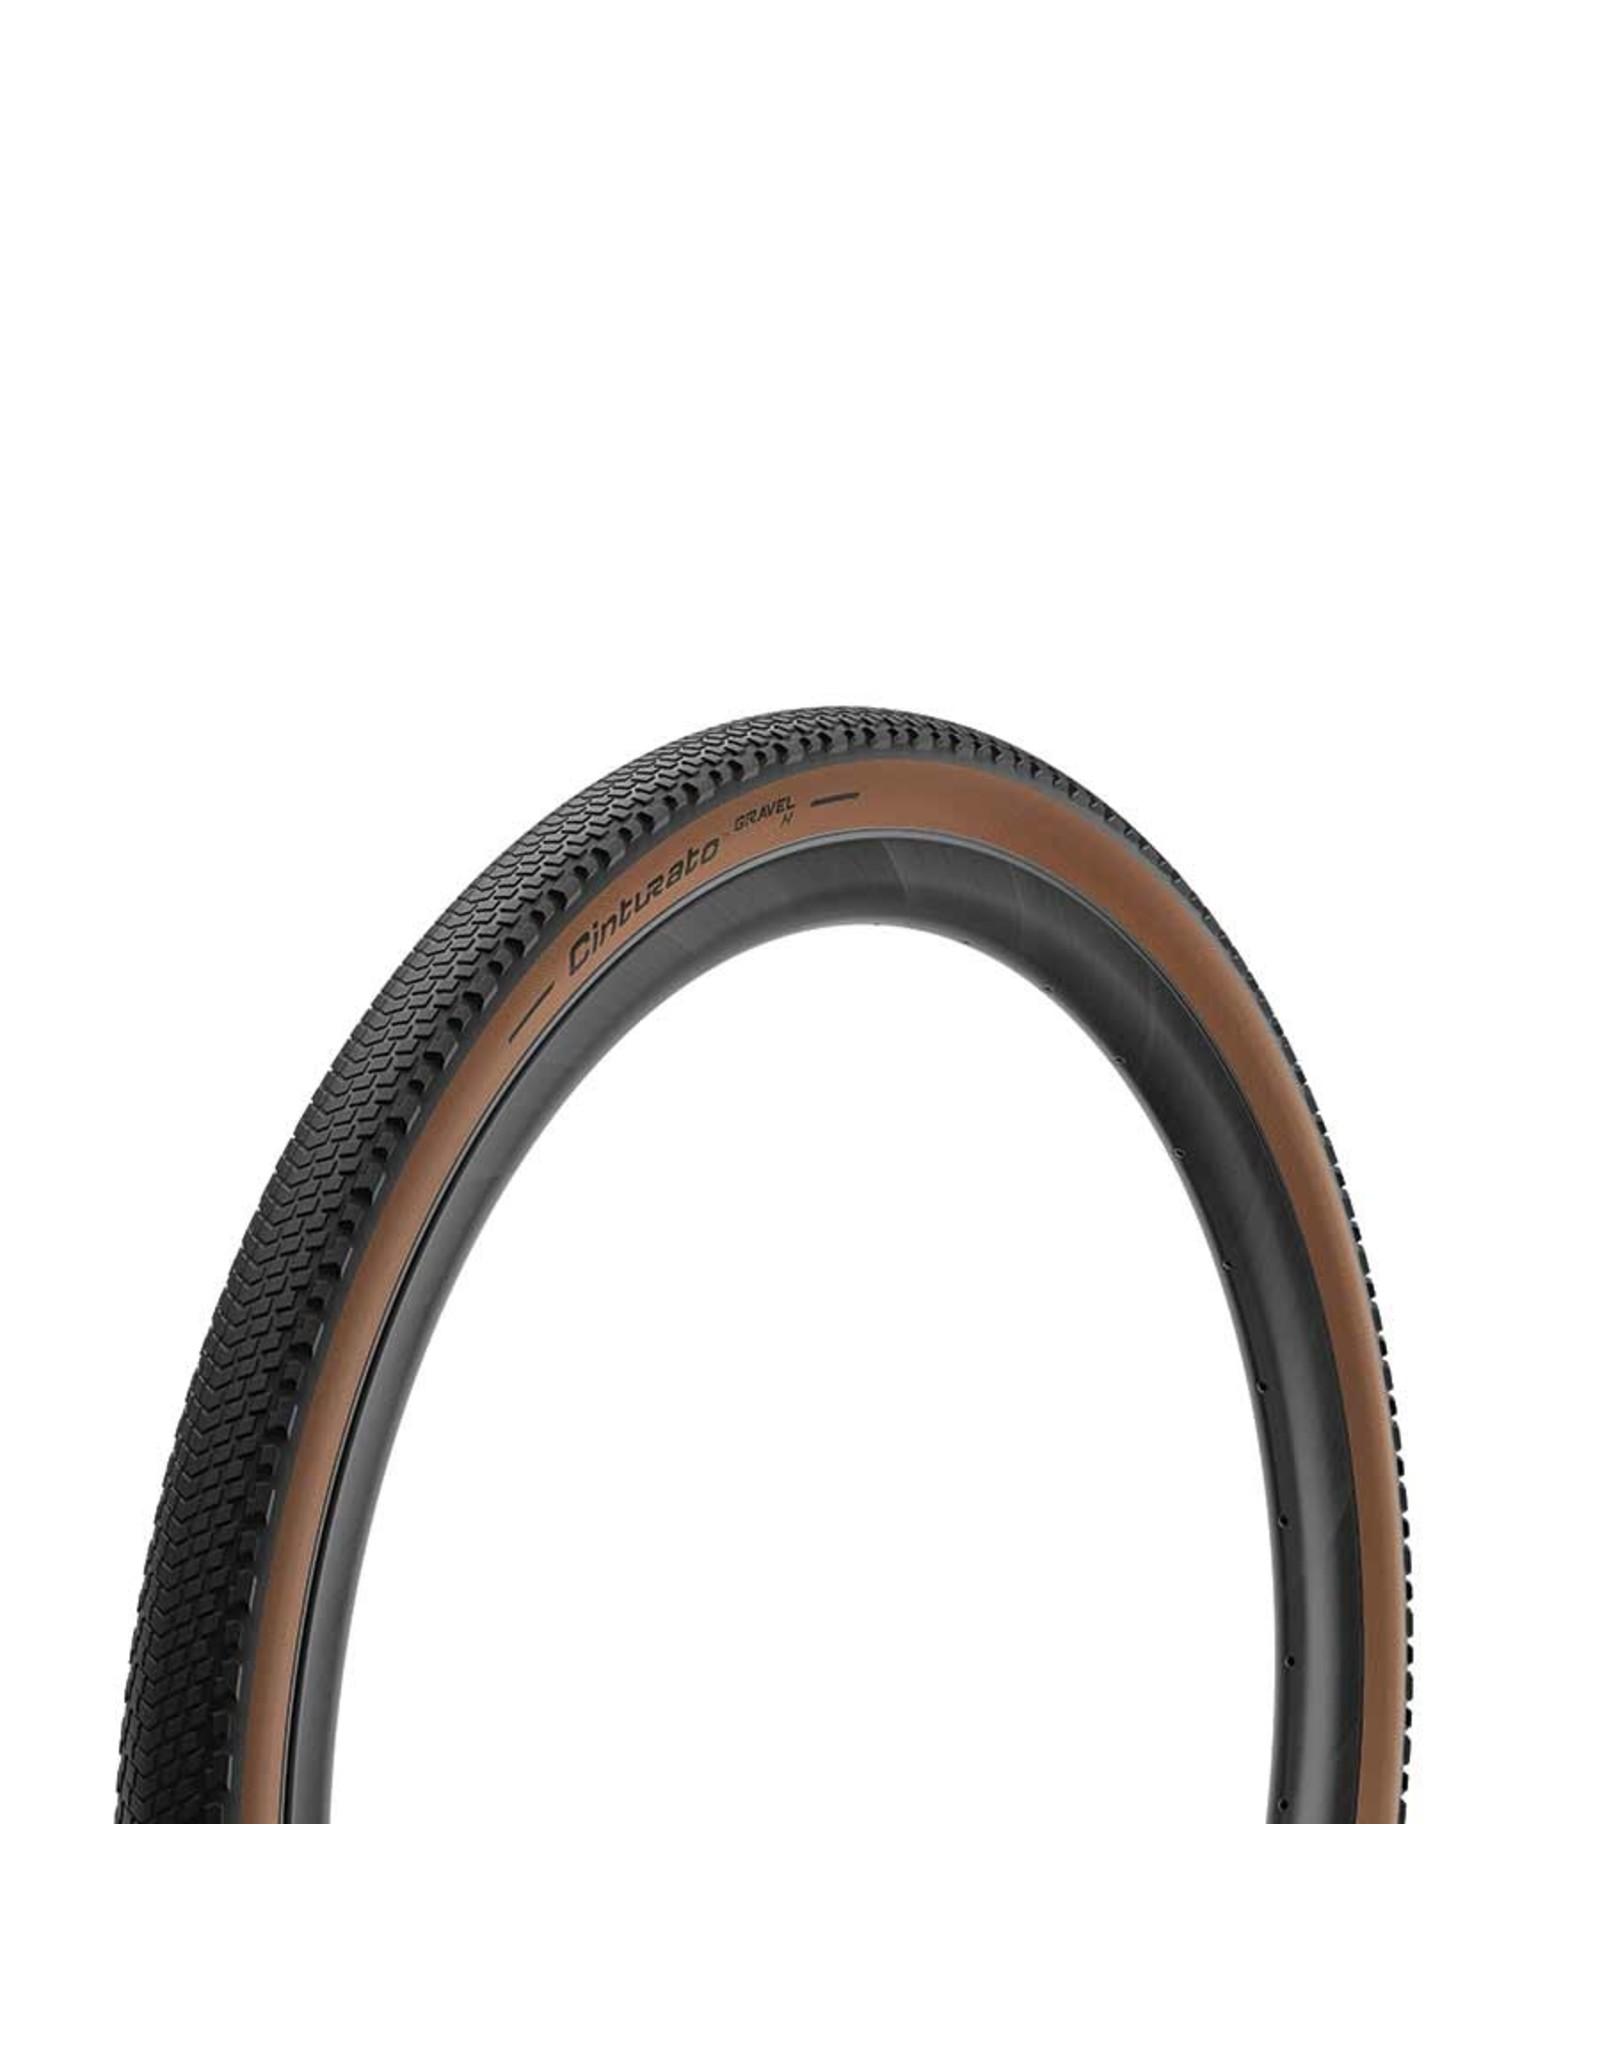 Pirelli Pirelli, Cinturato Gravel H, Tire, 700x35C, Folding, Tubeless Ready, SpeedGrip, 127TPI, Beige